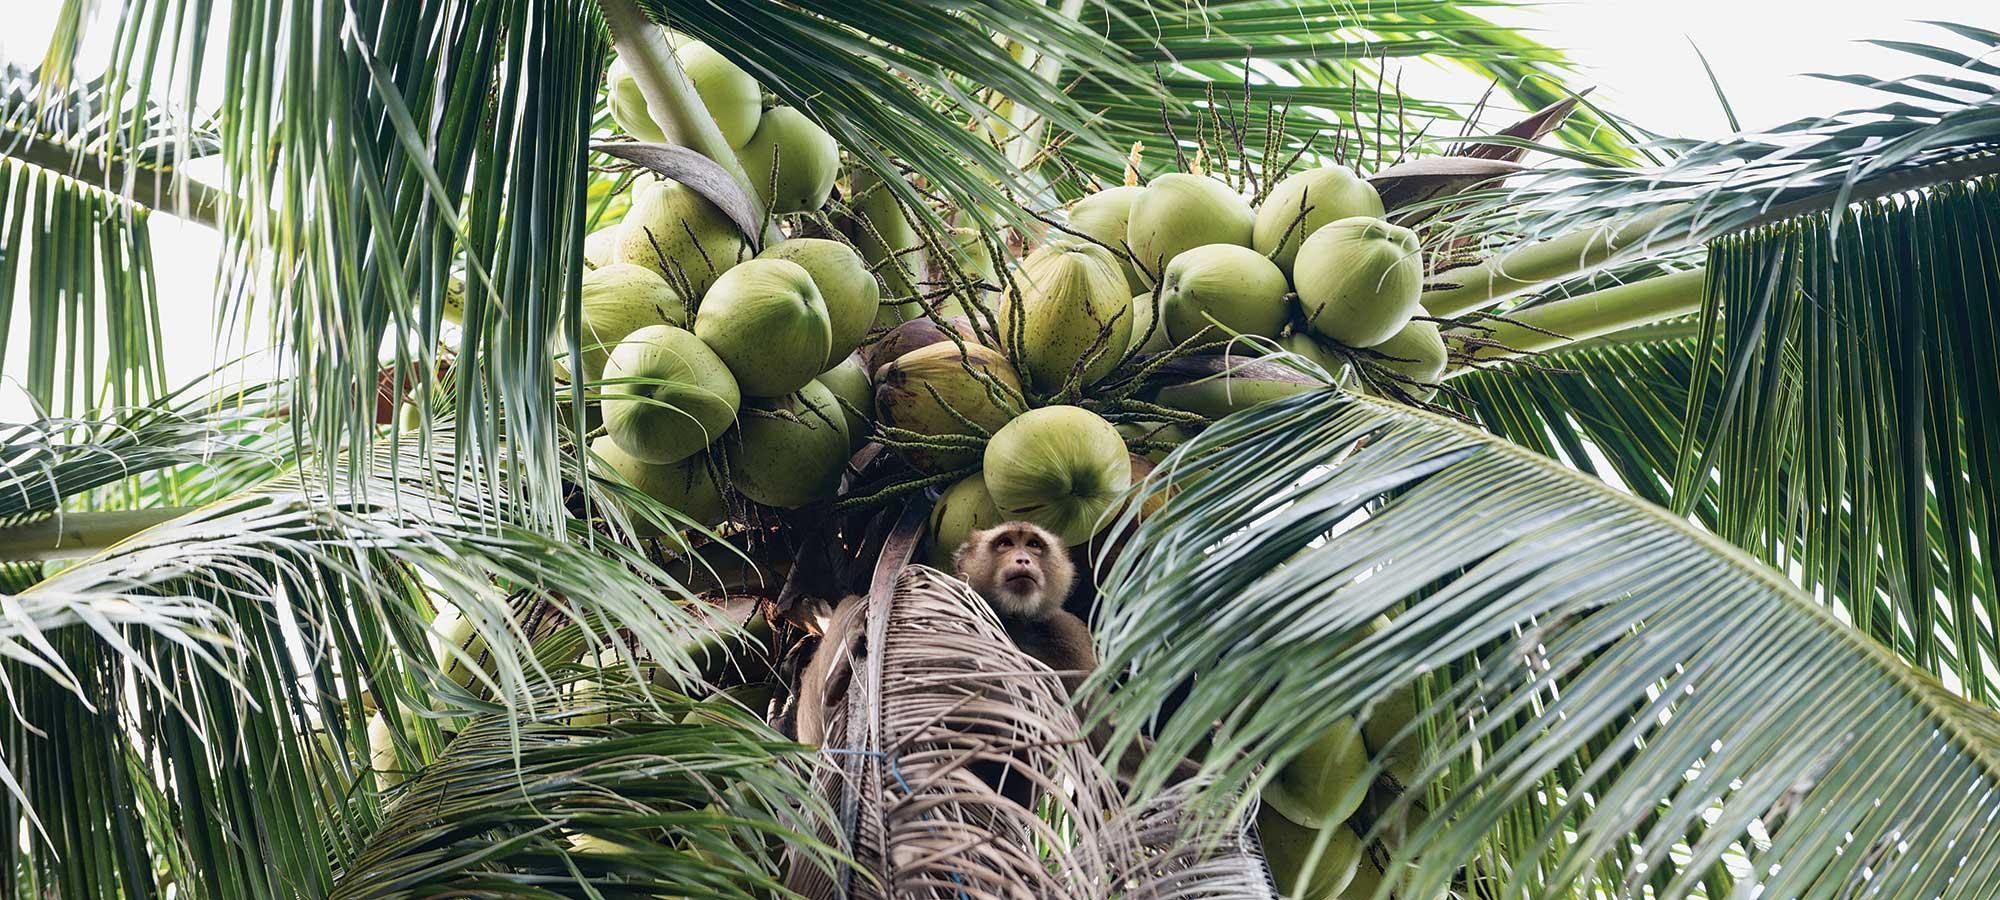 monkey farming coconuts